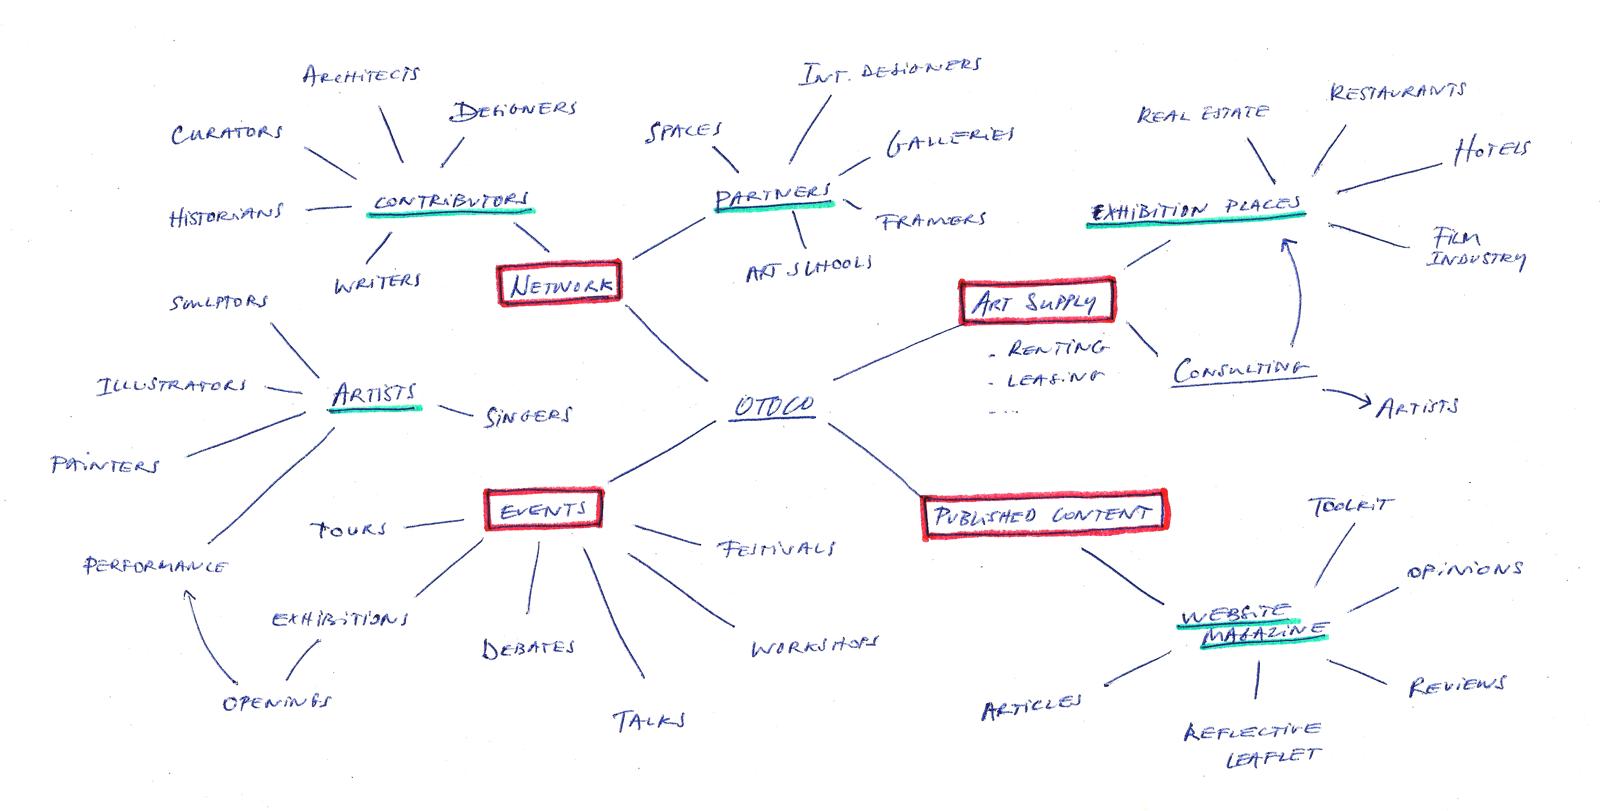 vlevle-otoco_structure